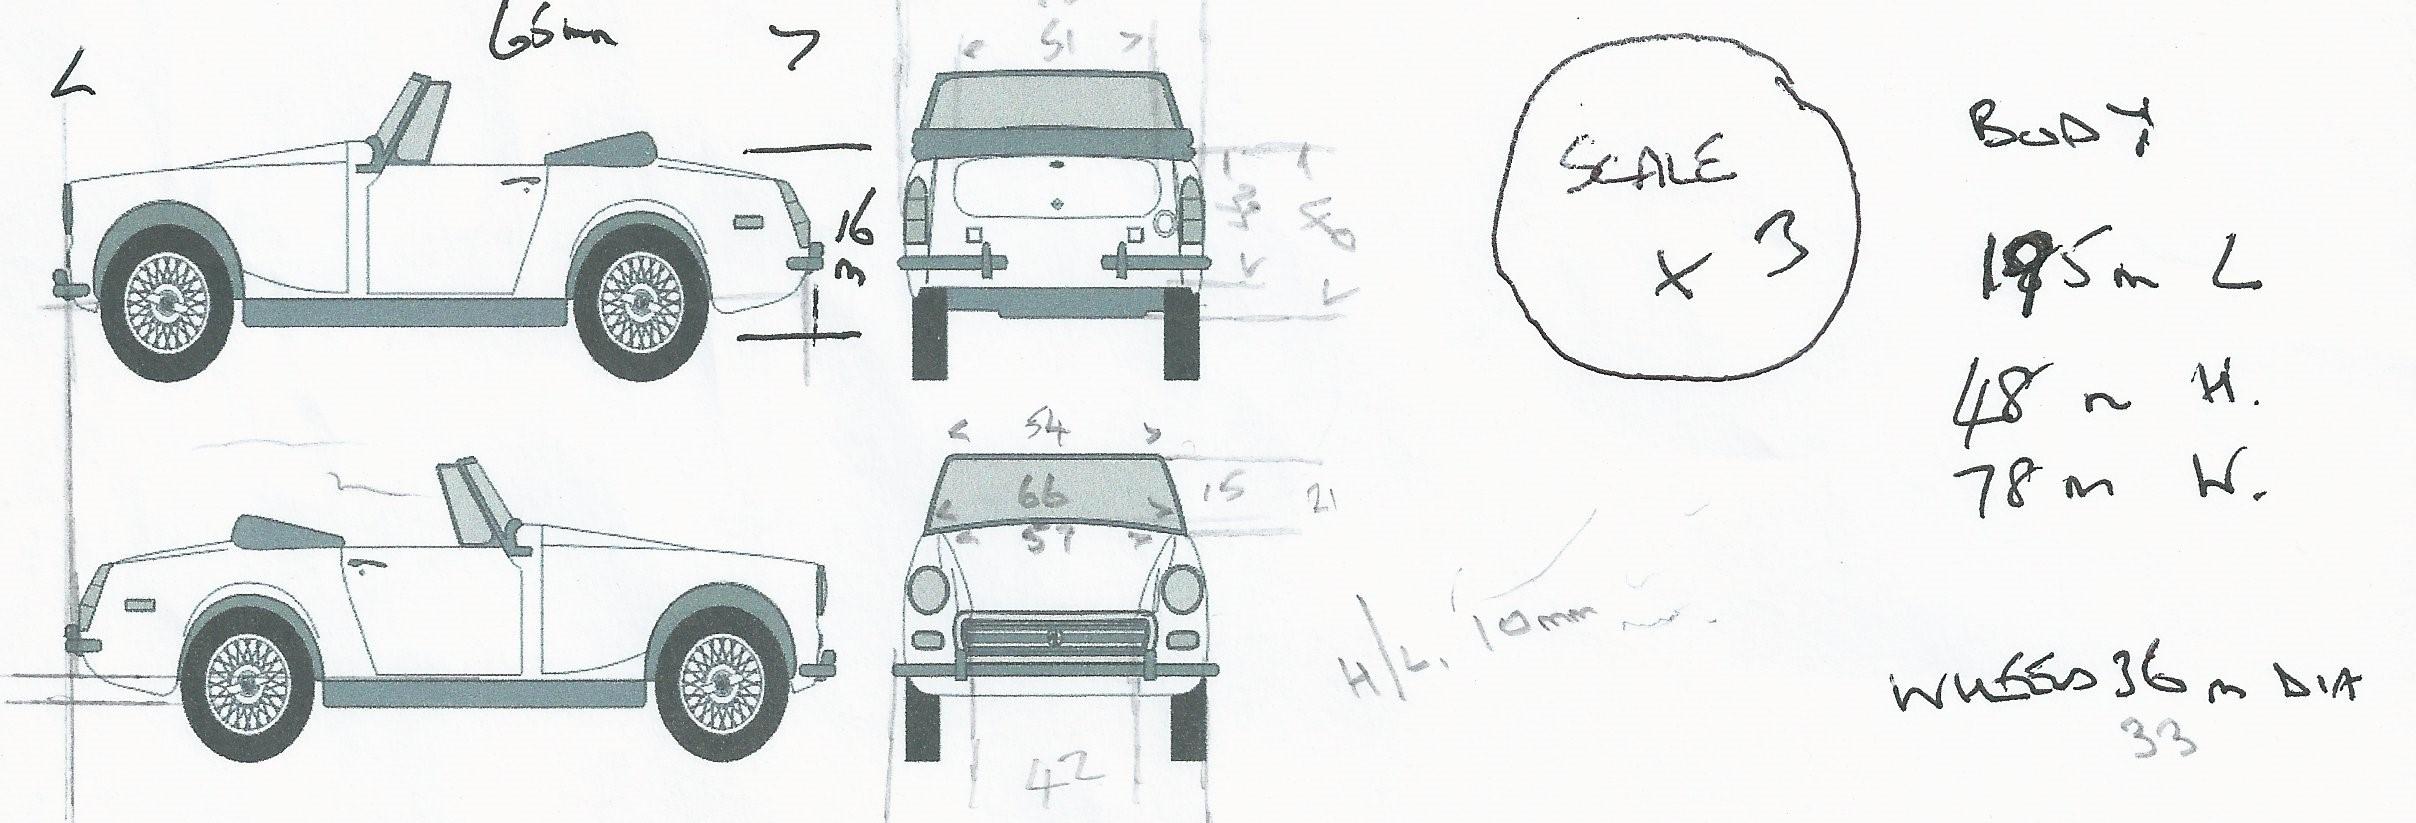 SCAN0181.JPG